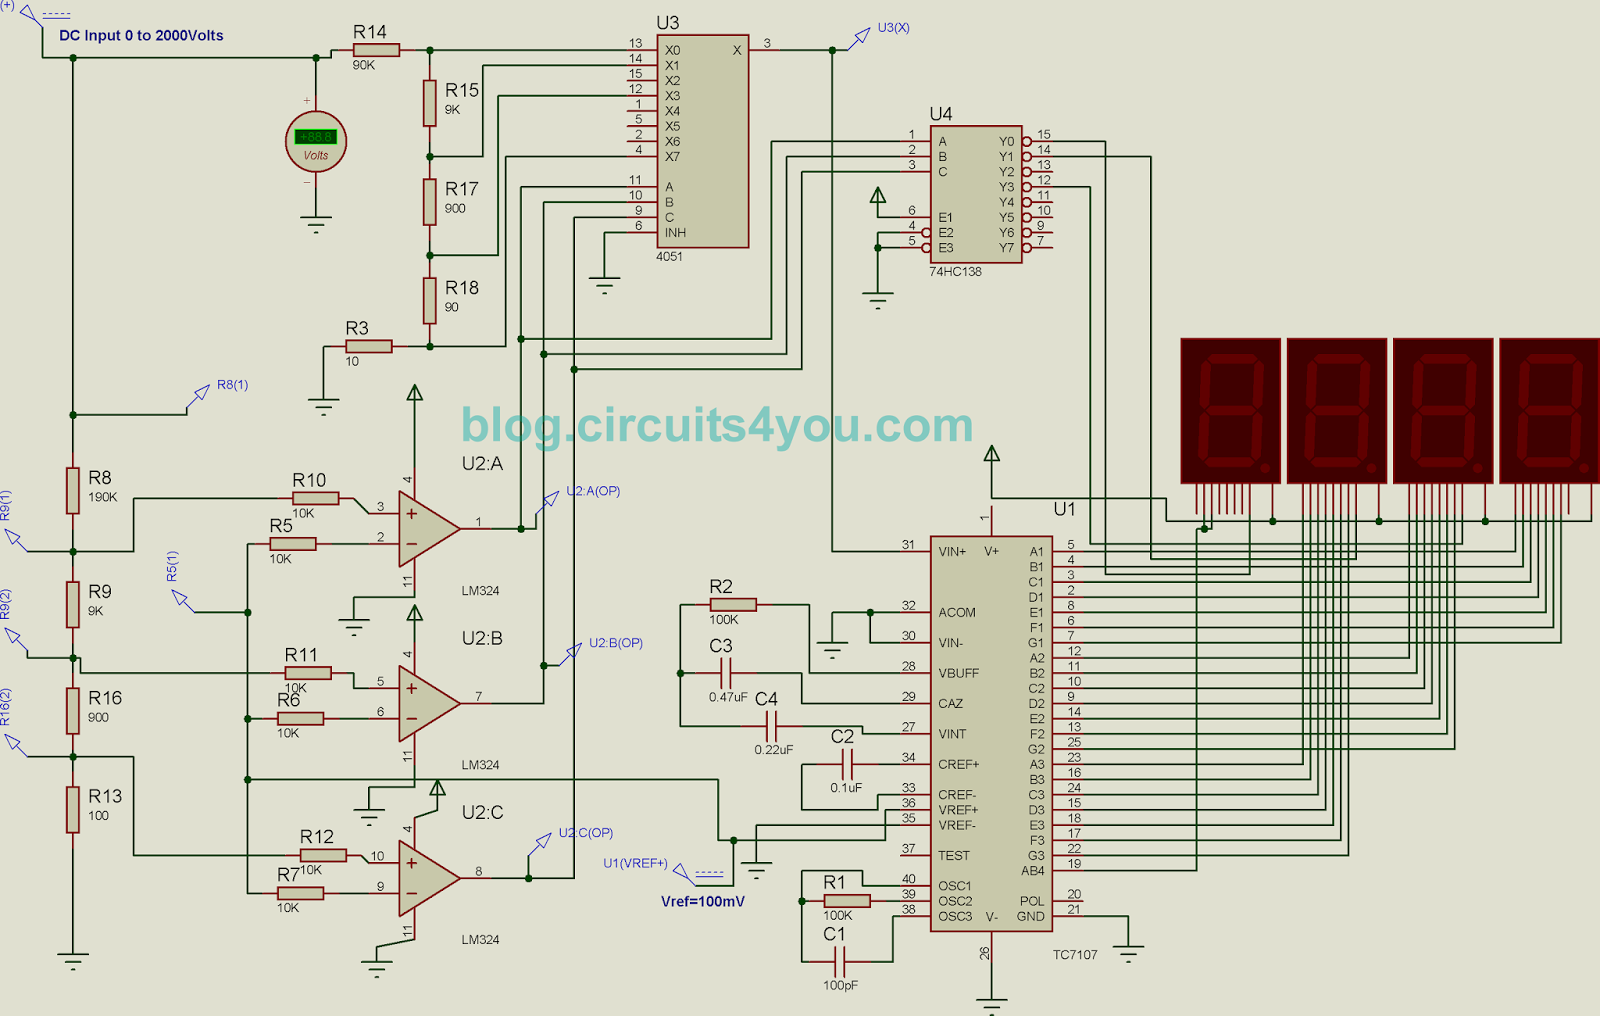 icl7107 autorange voltmeter circuits4you com rh blog circuits4you com Simple Schematic Diagram Schematic Diagram Symbols